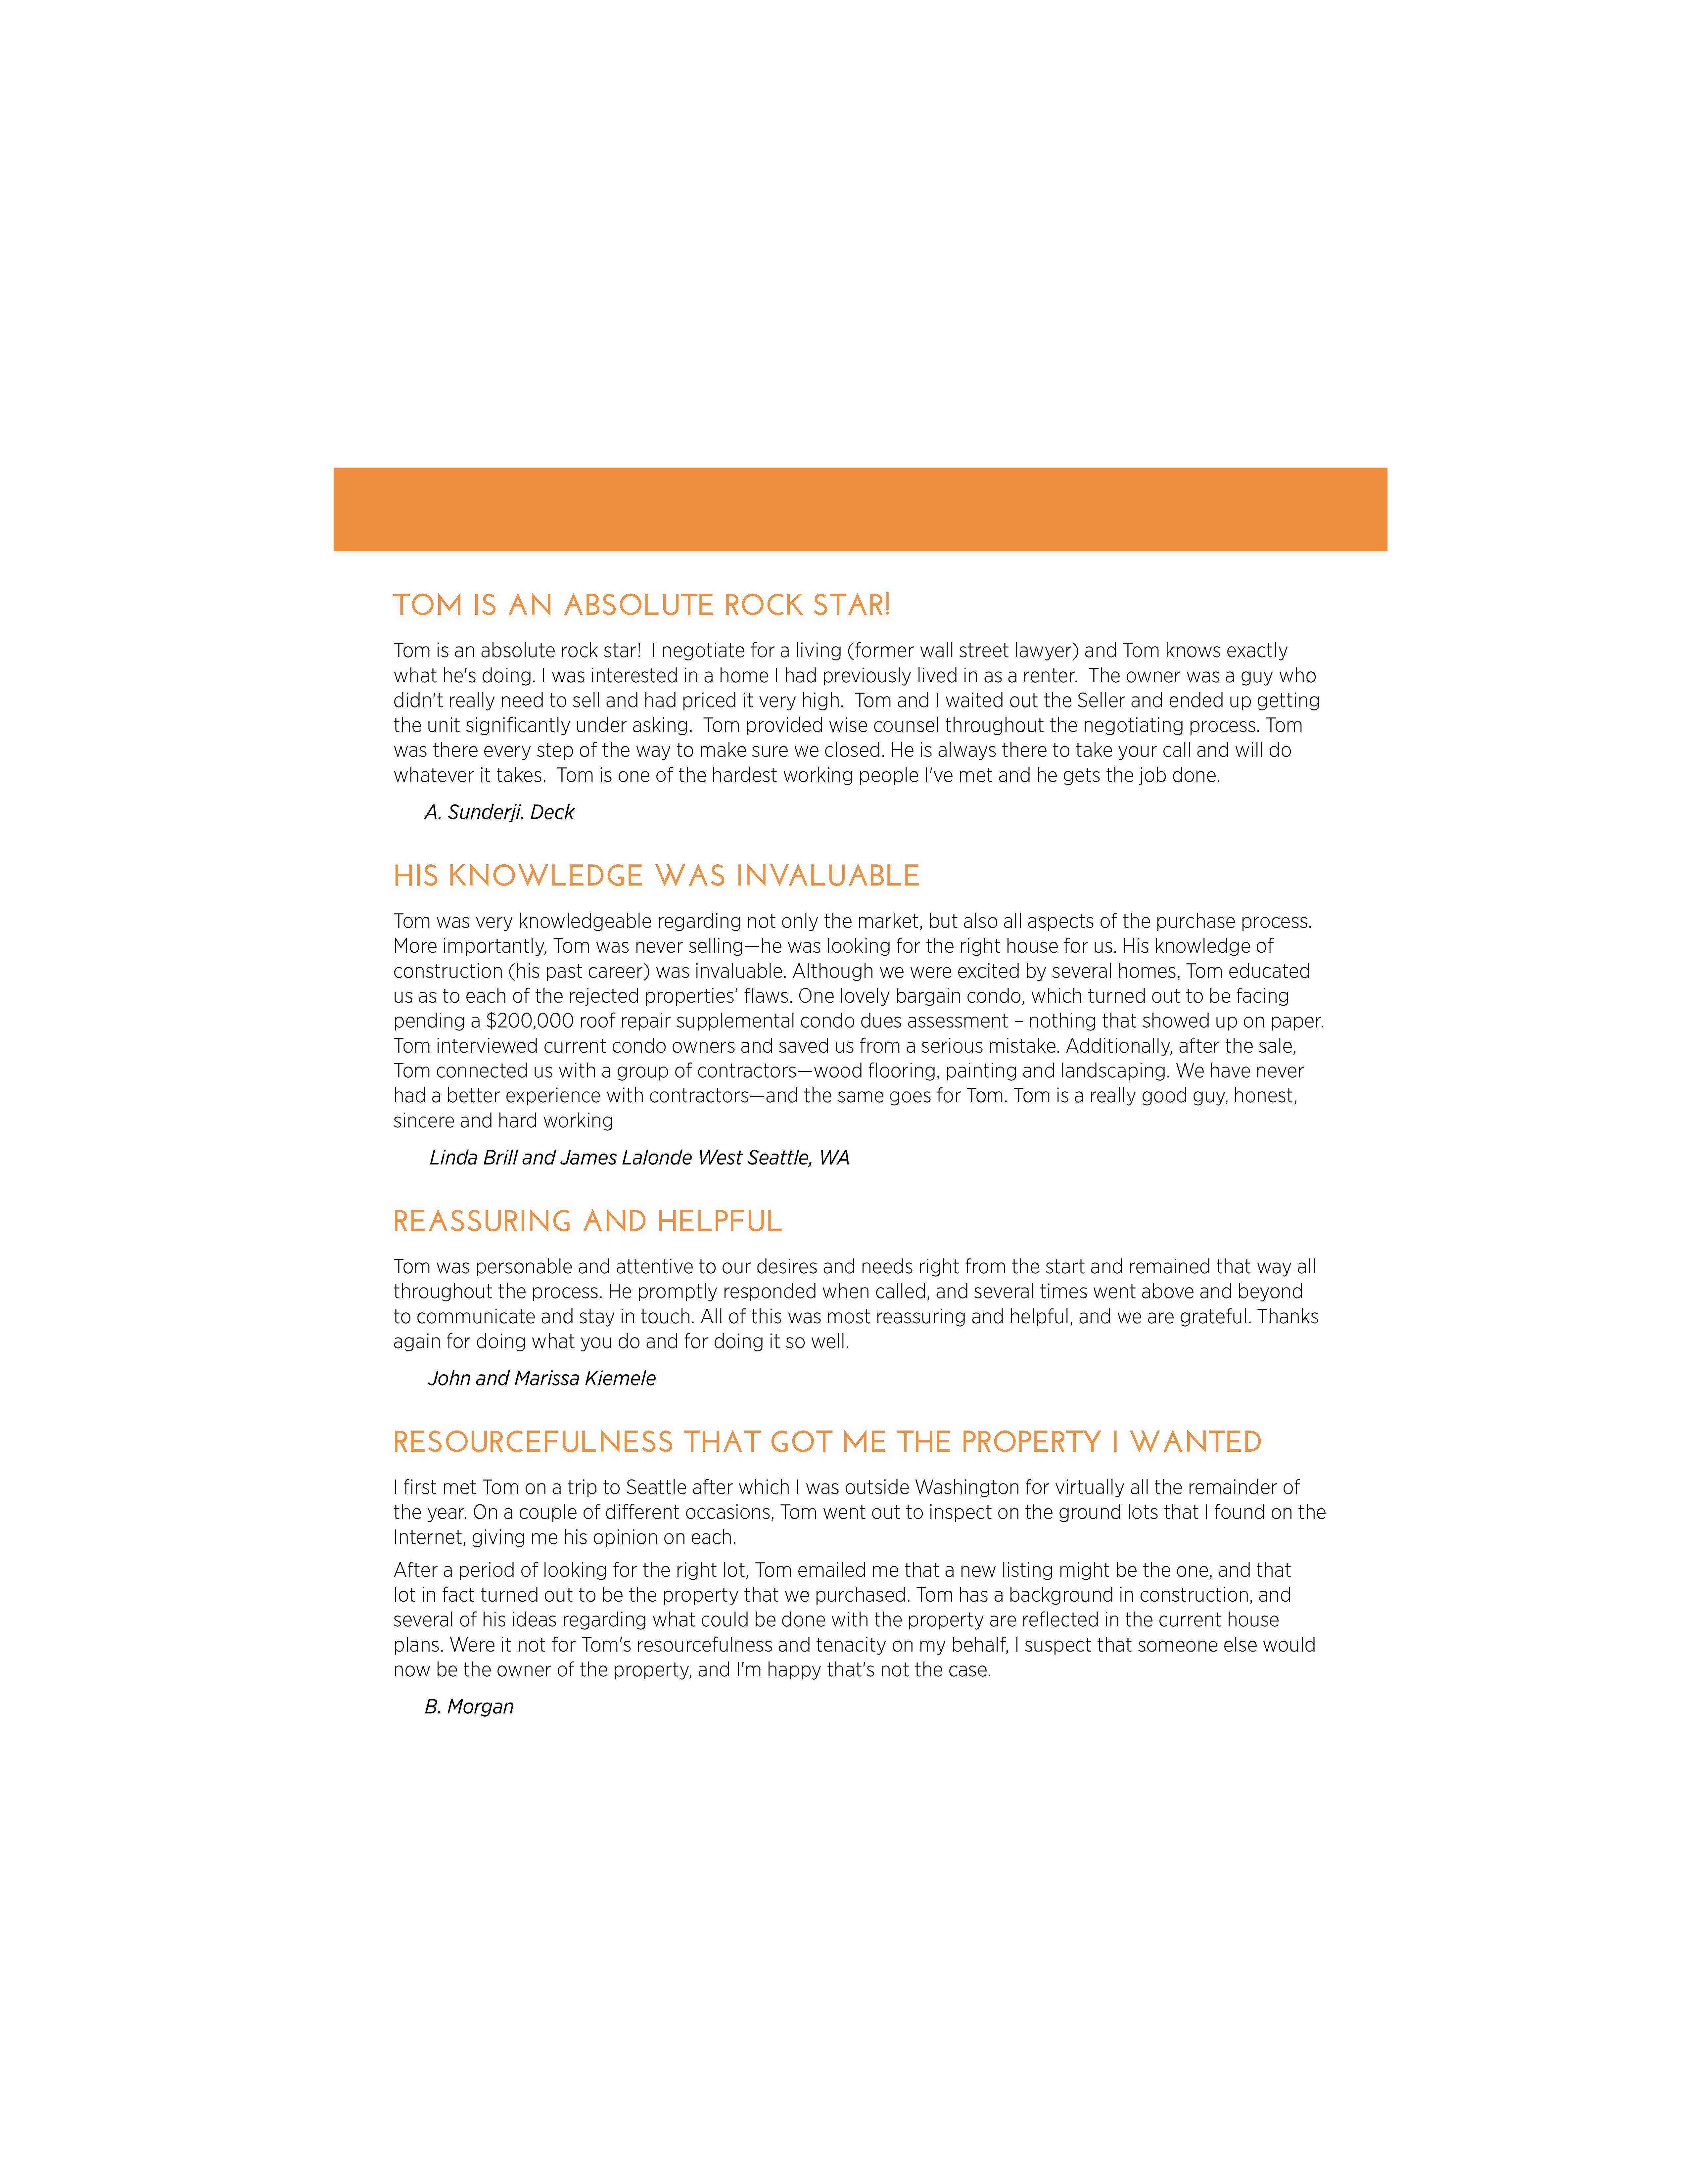 Choosing a Broker Page 4